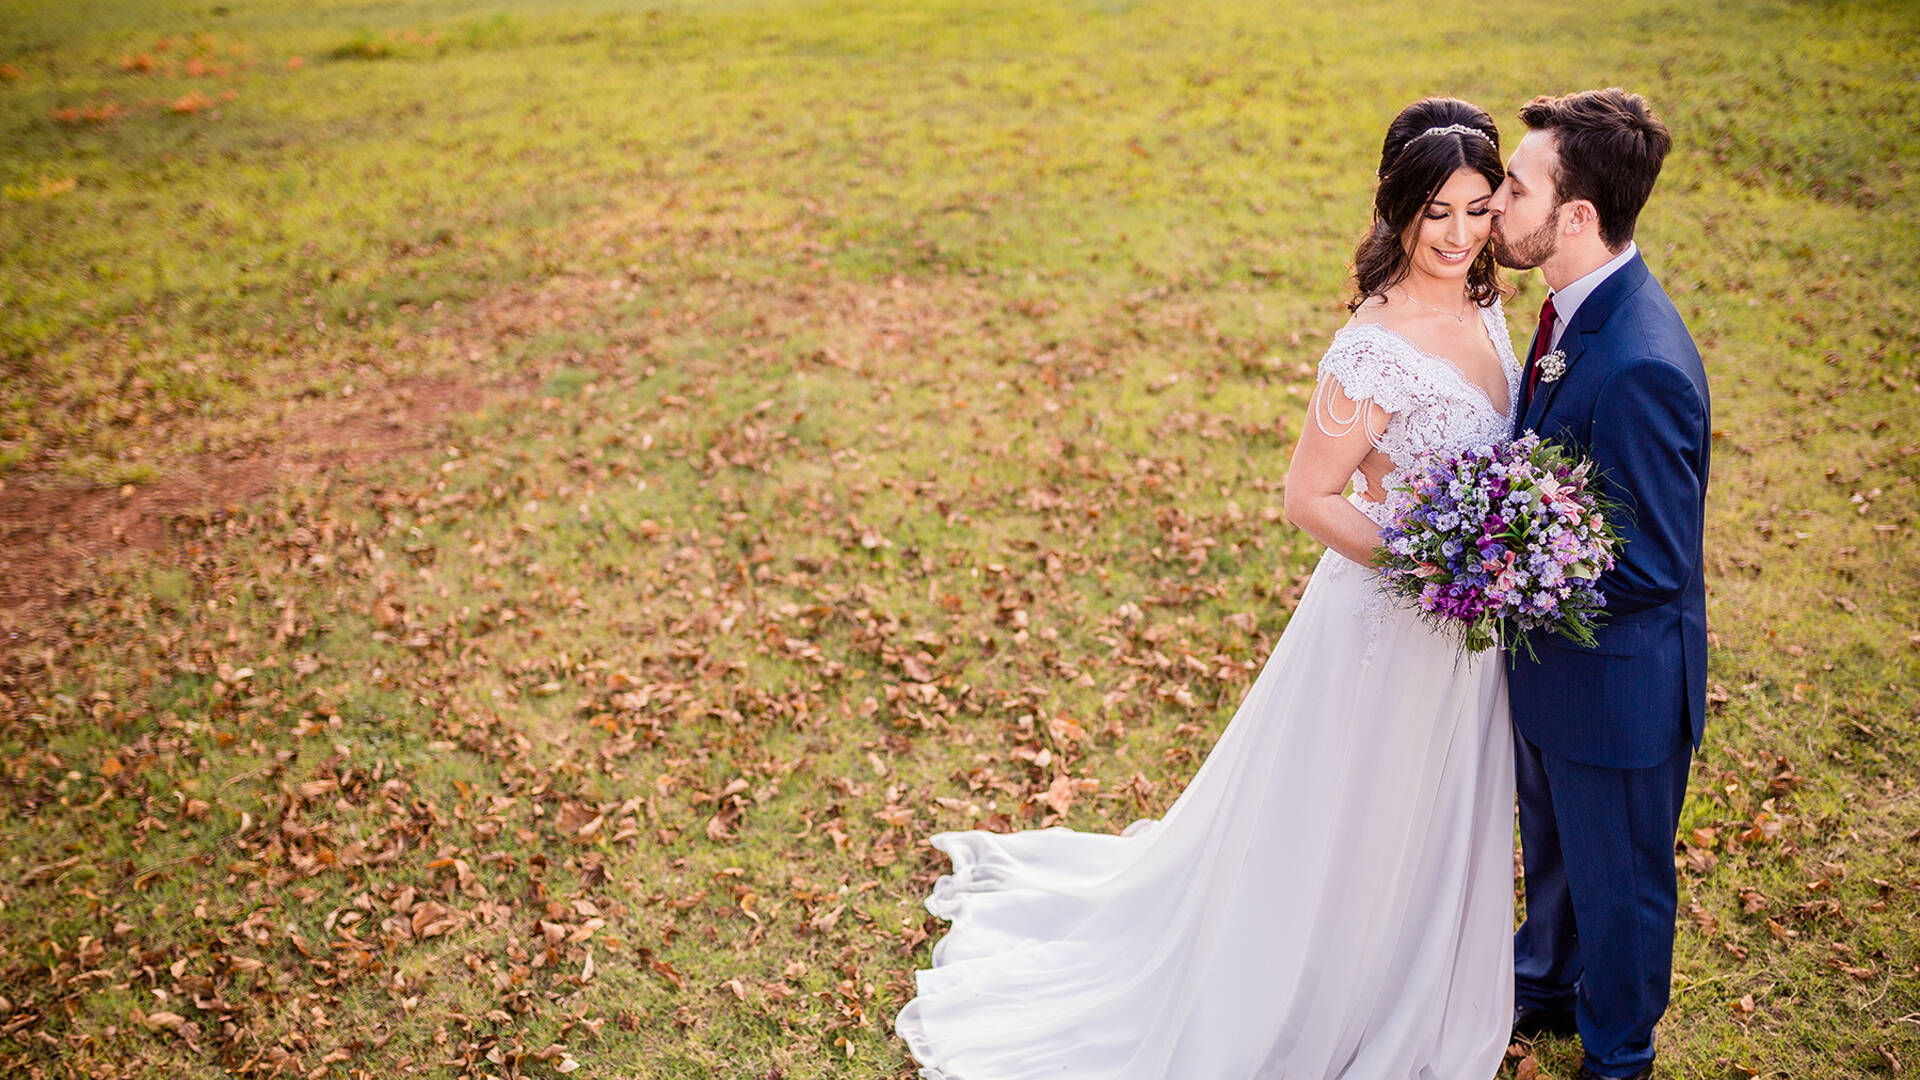 Casamento de Vanessa e Deiner